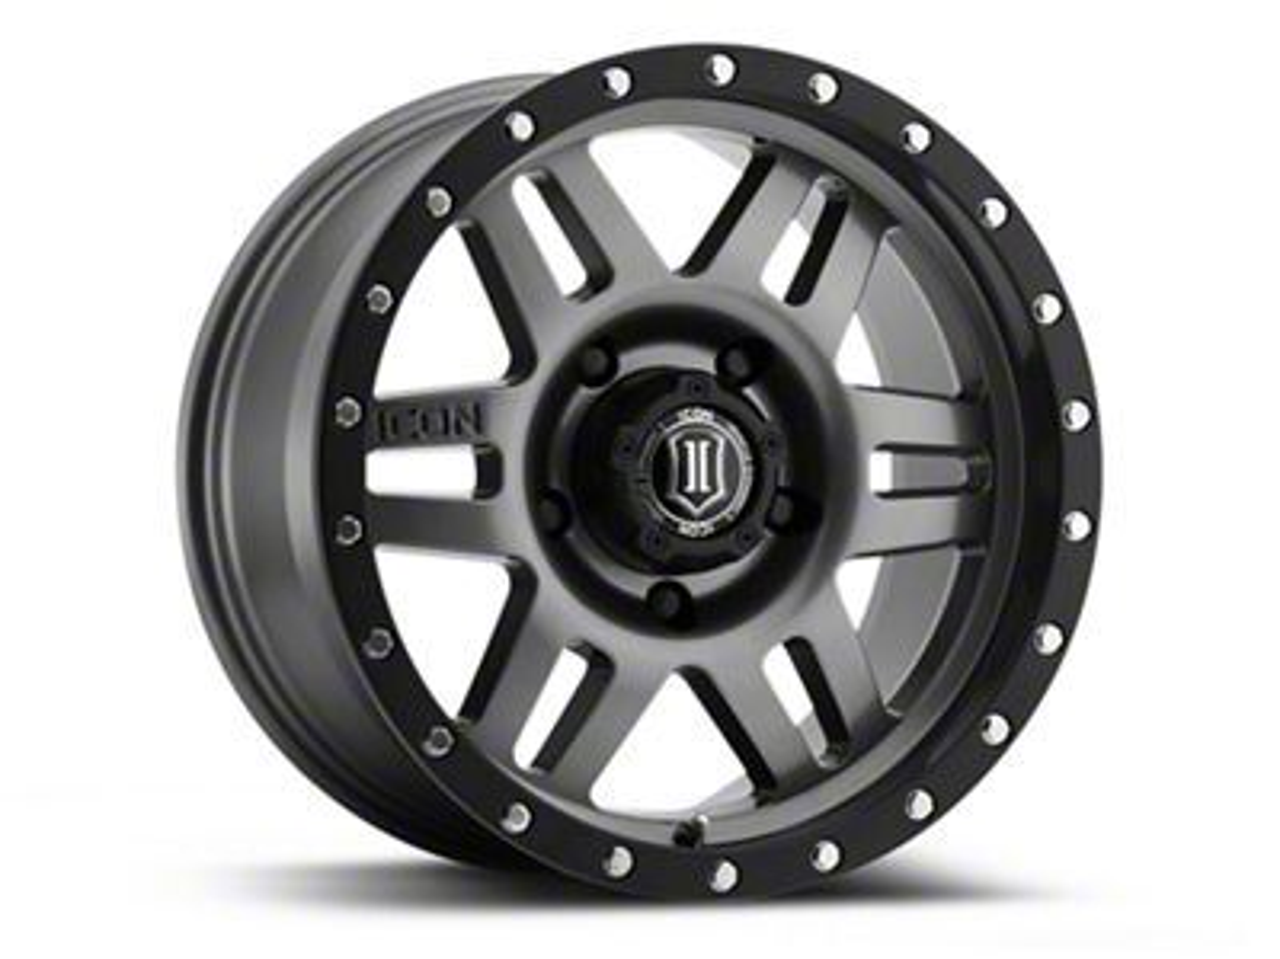 ICON Vehicle Dynamics Six Speed Gunmetal Wheel - 17x8.5 (07-18 Jeep Wrangler JK; 2018 Jeep Wrangler JL)